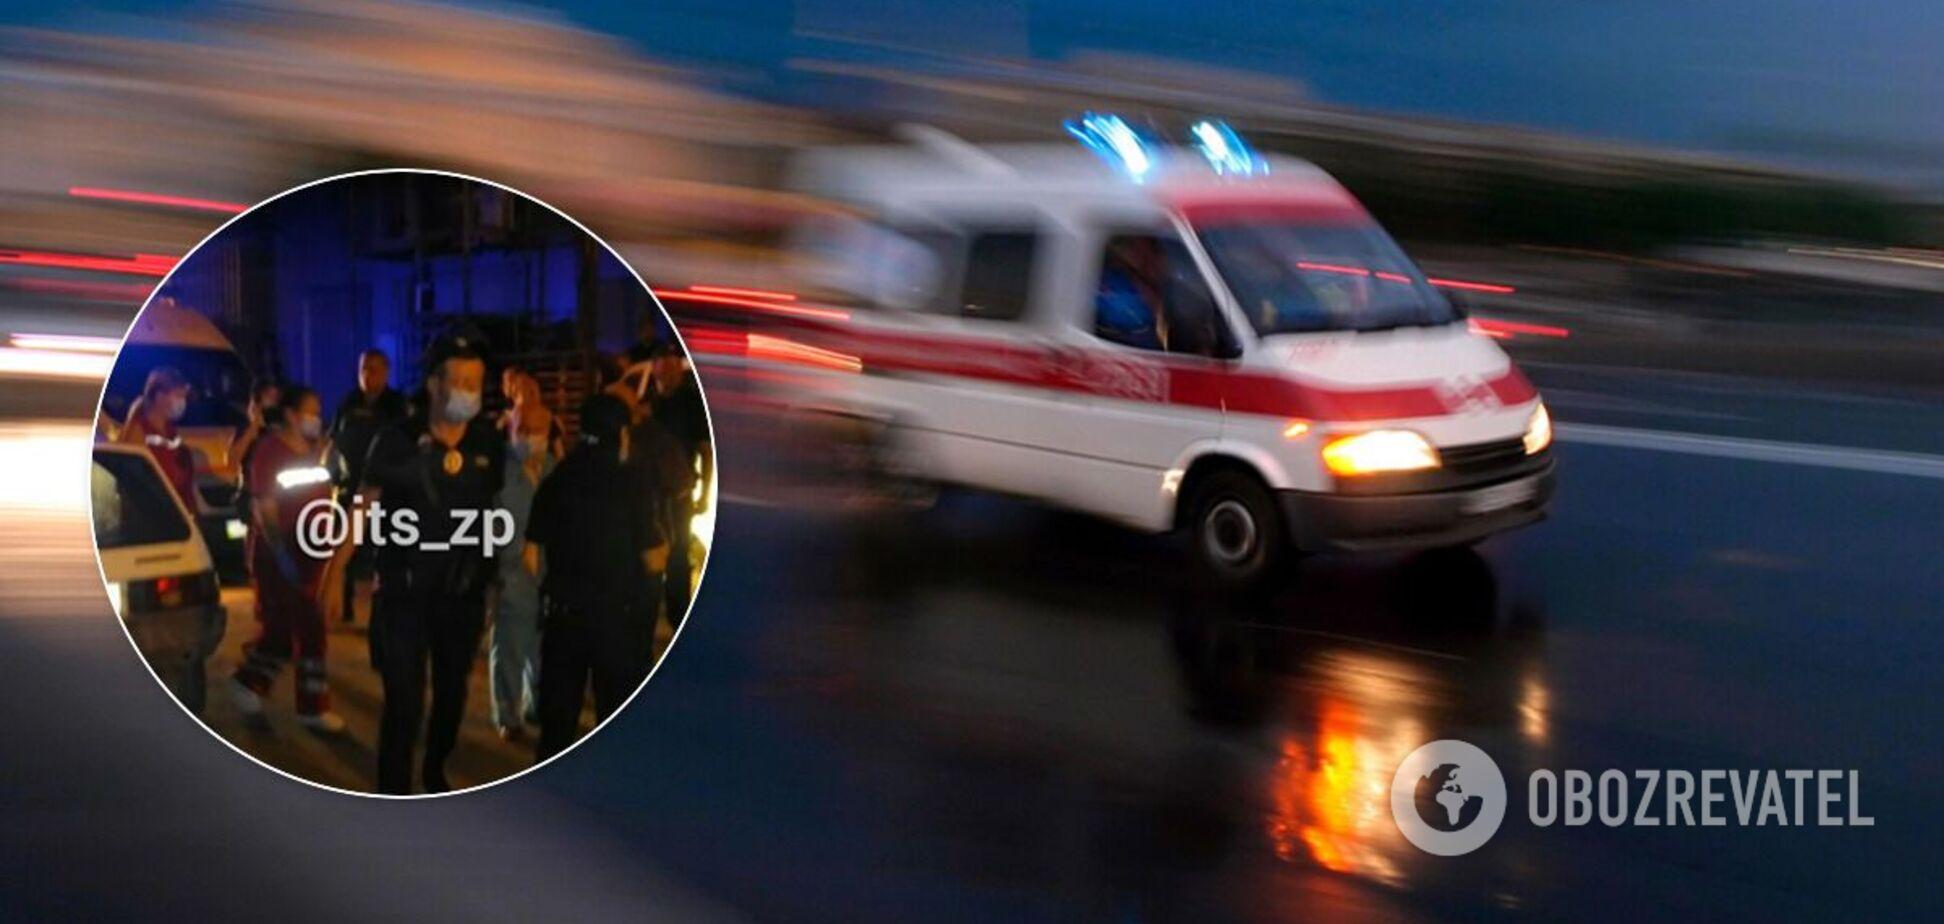 В Запорожье возле супермаркета стреляли в мужчину. Фото и видео 18+